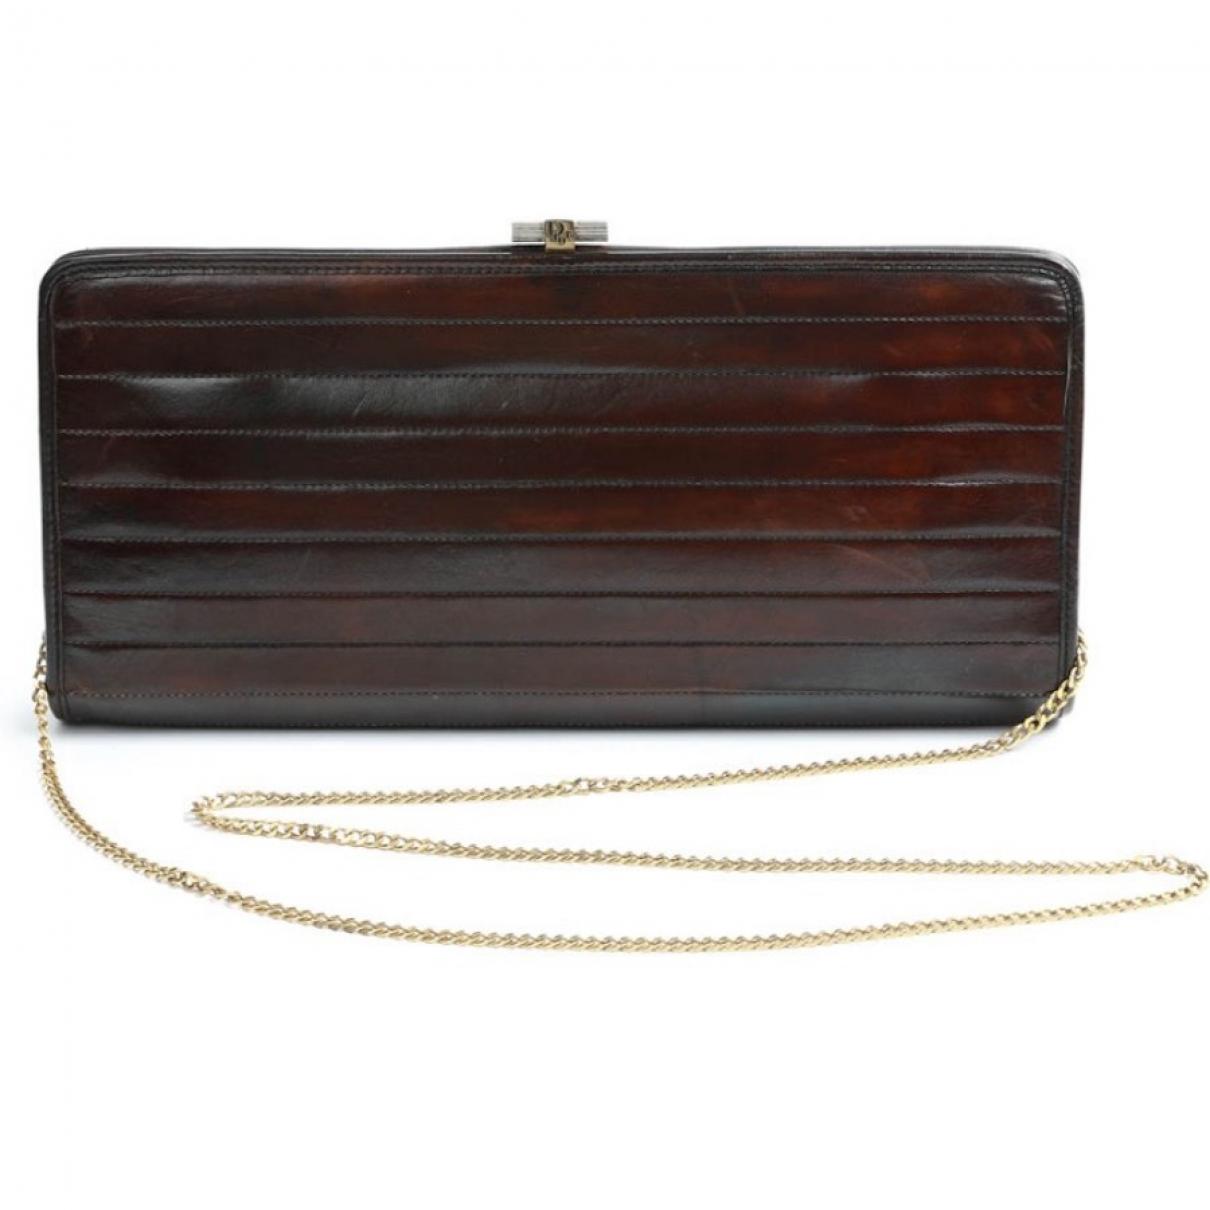 Dior \N Brown Leather Clutch bag for Women \N